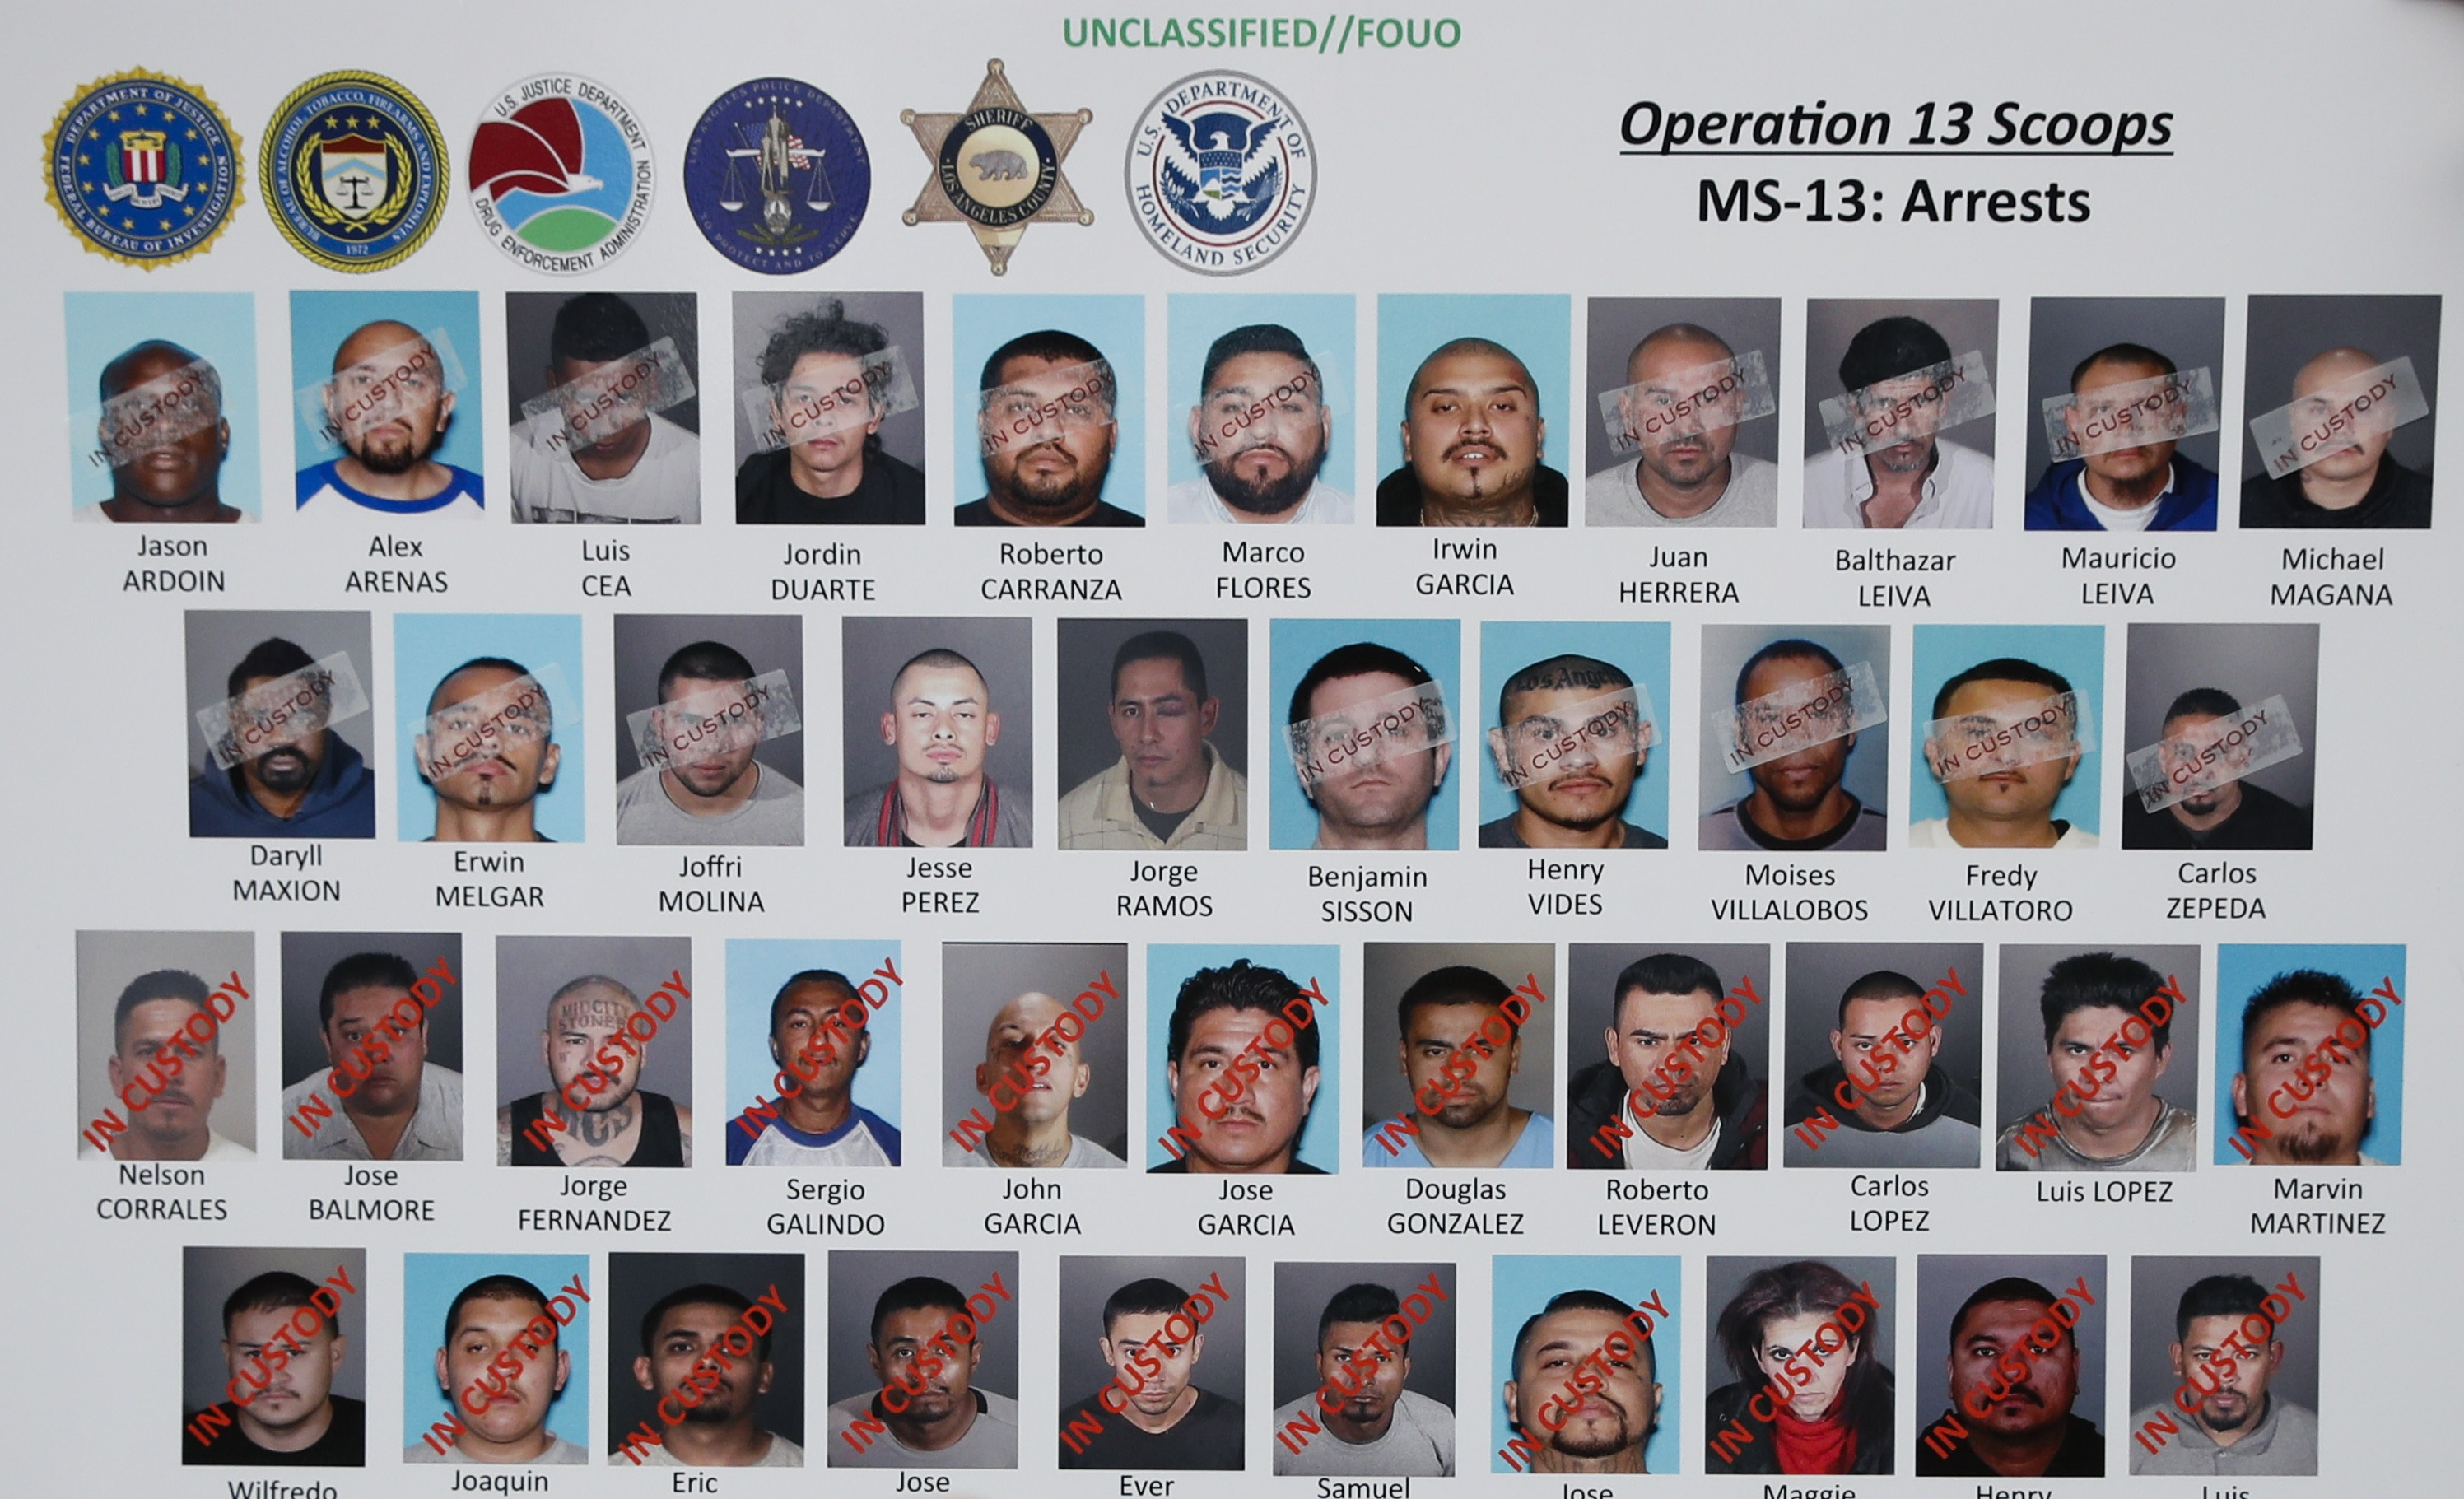 https://cdn4.uvnimg.com/52/3d/bb7125e54e2fb4da4b3a020746f0/editada-ms-13-arrests-vele-4.jpg